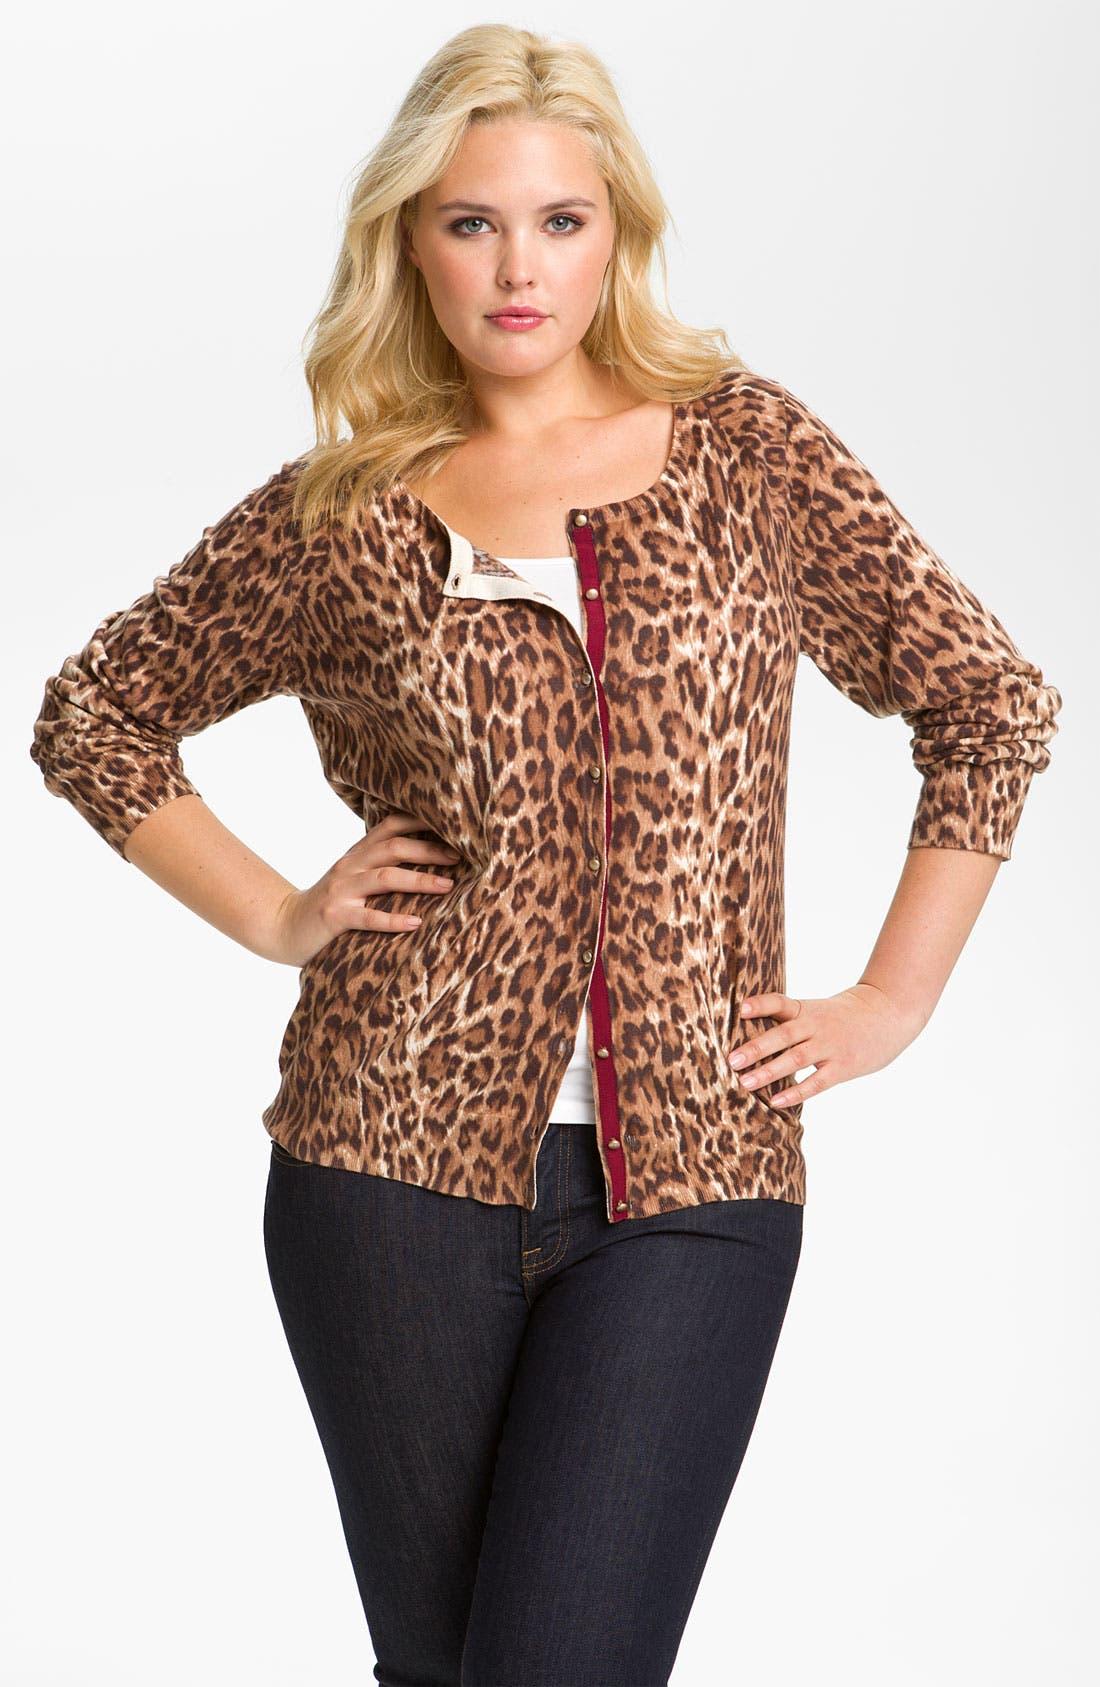 Alternate Image 1 Selected - Lucky Brand Cheetah Print Cardigan (Plus)